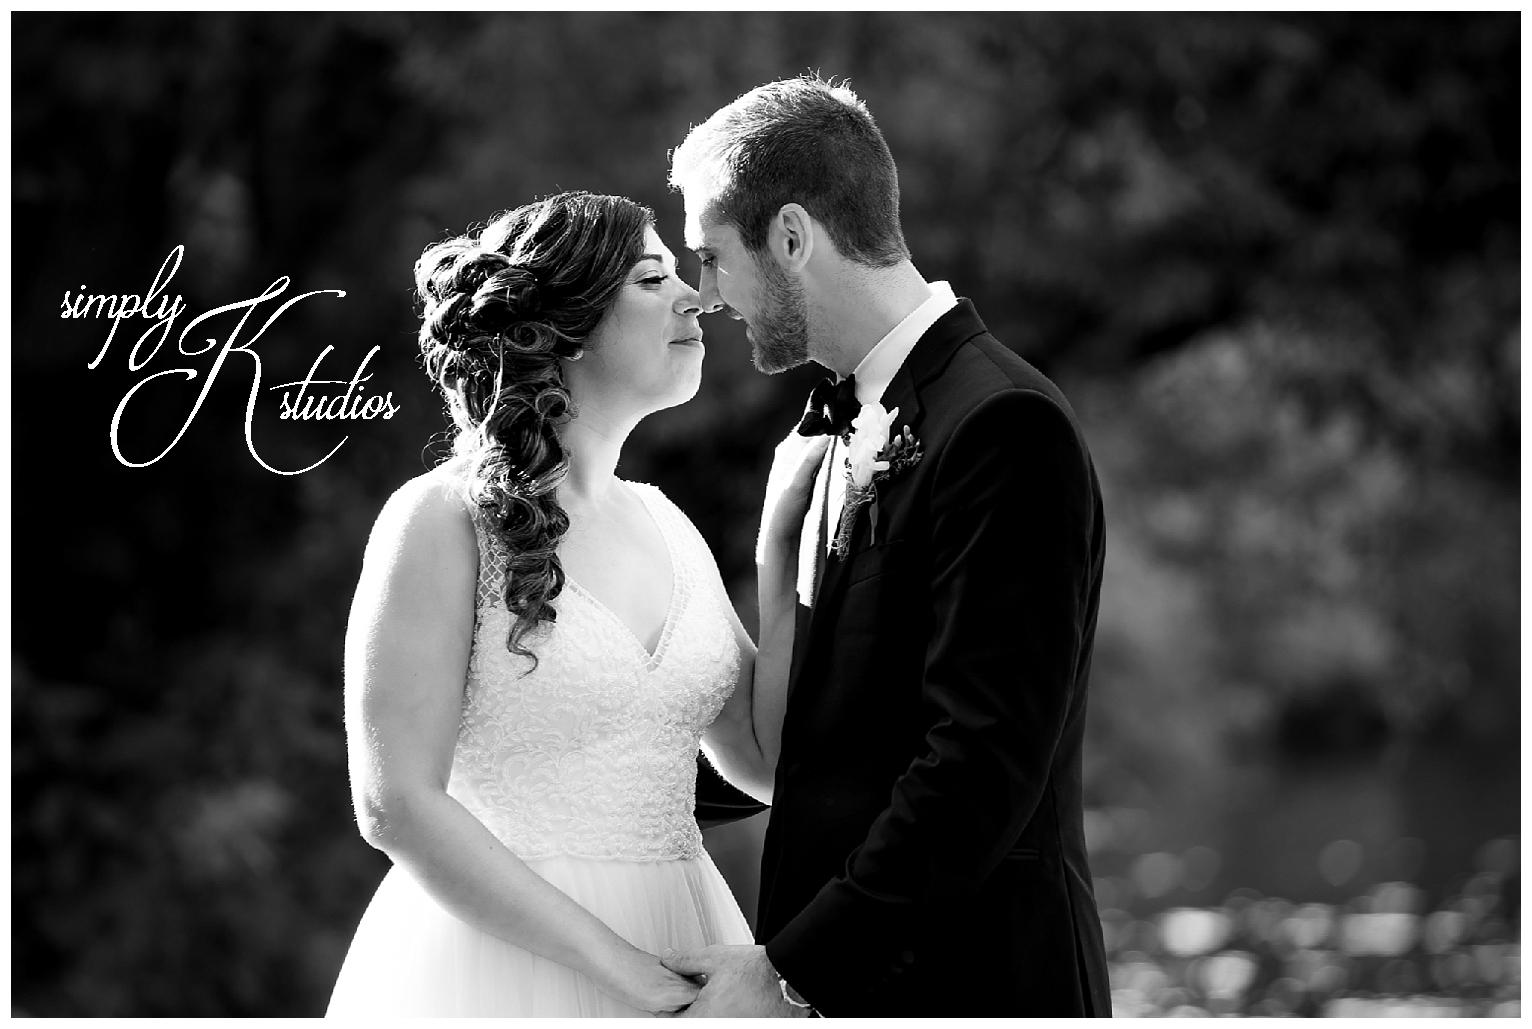 Photojouarnlistic Wedding Photographers in CT.jpg